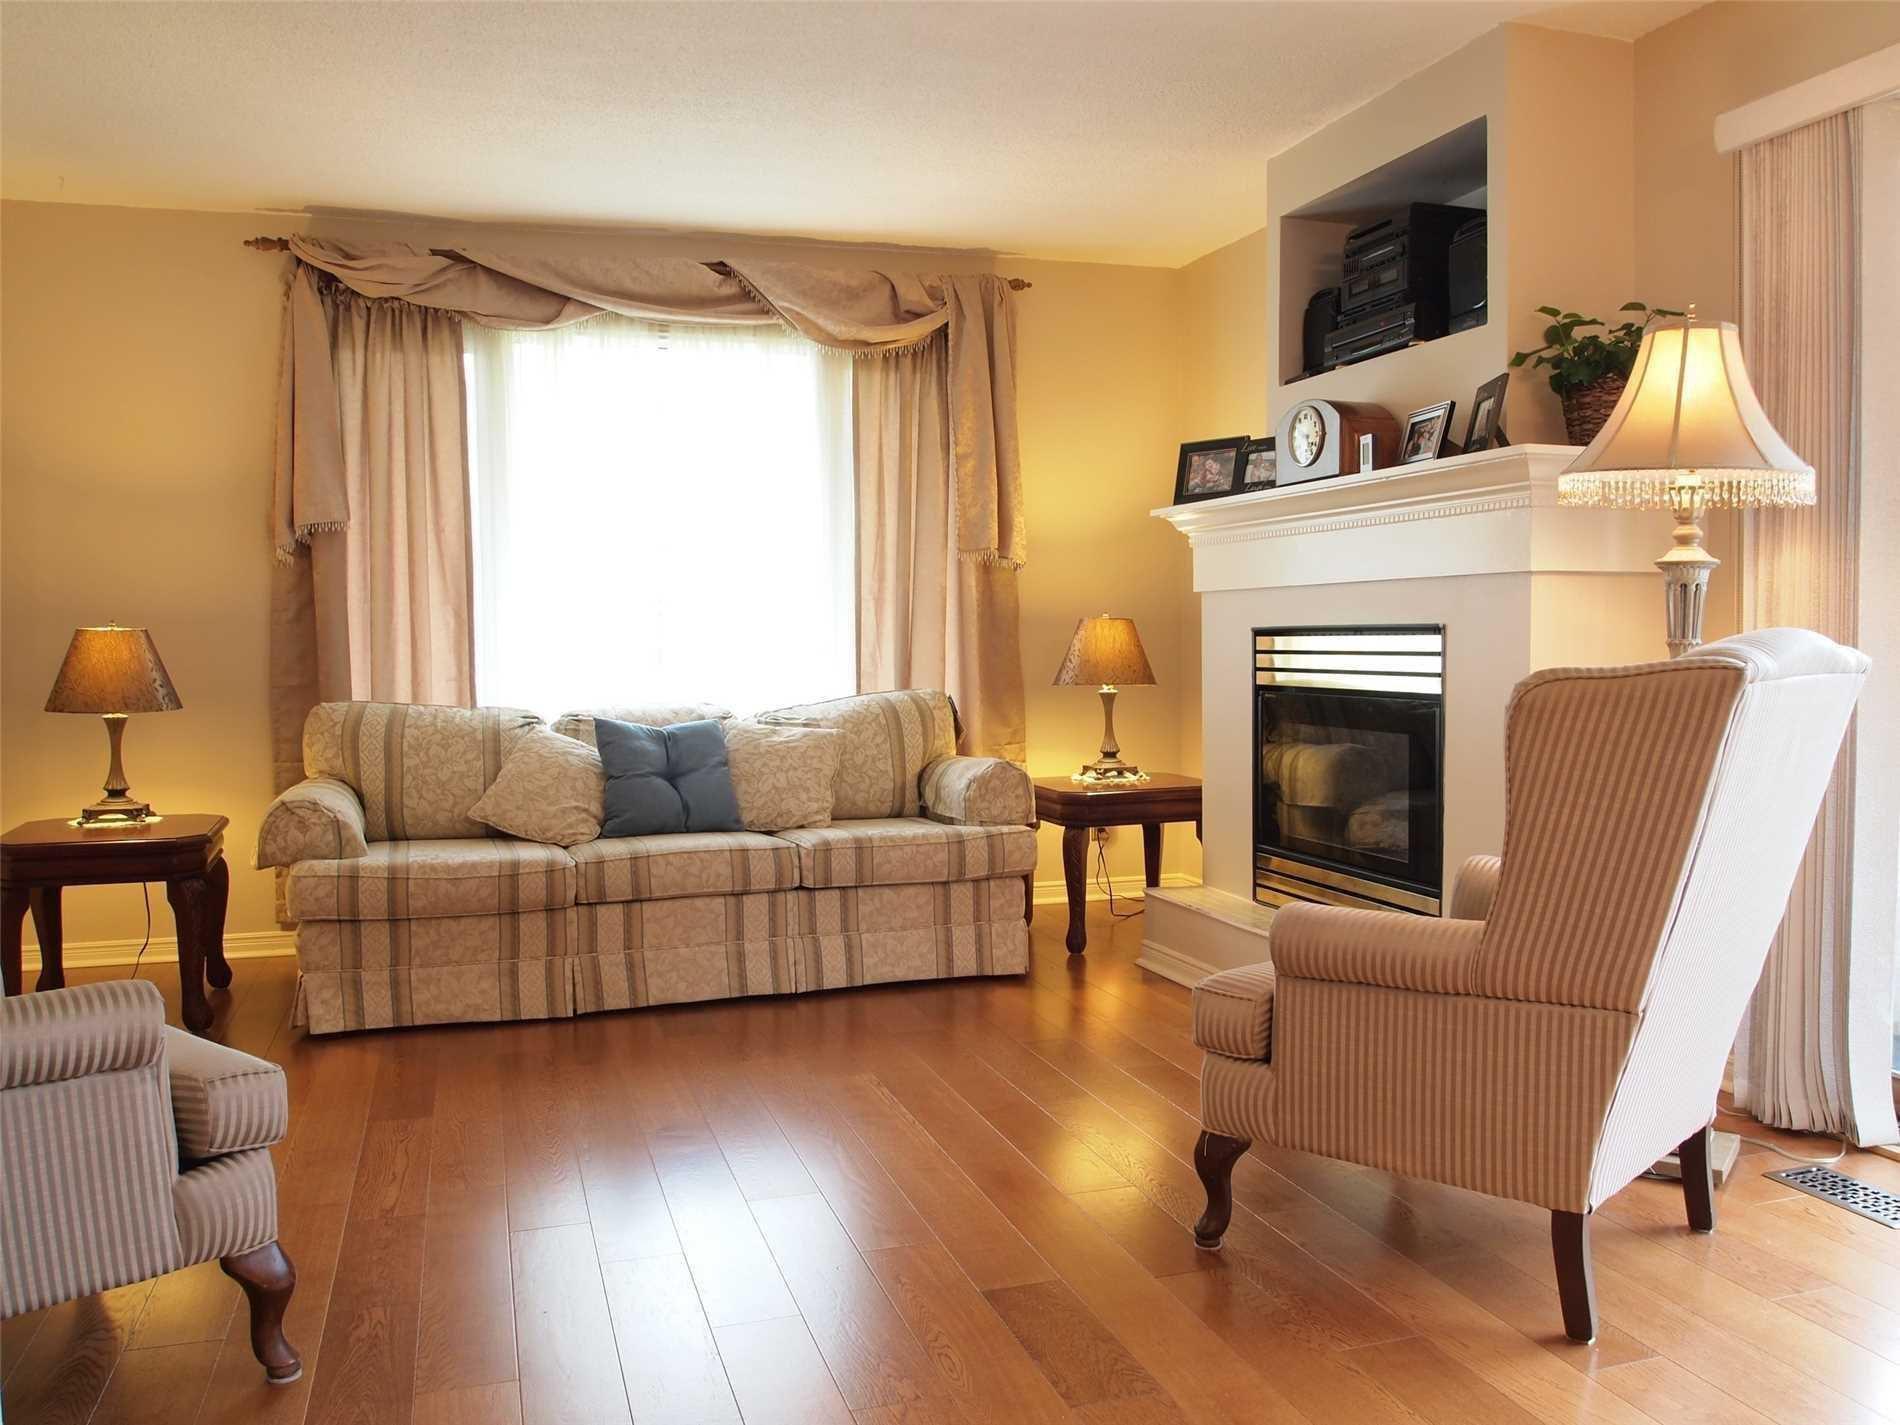 Photo 5: Photos: 105 Fifth Street in Brock: Beaverton House (Bungalow) for sale : MLS®# N4564596